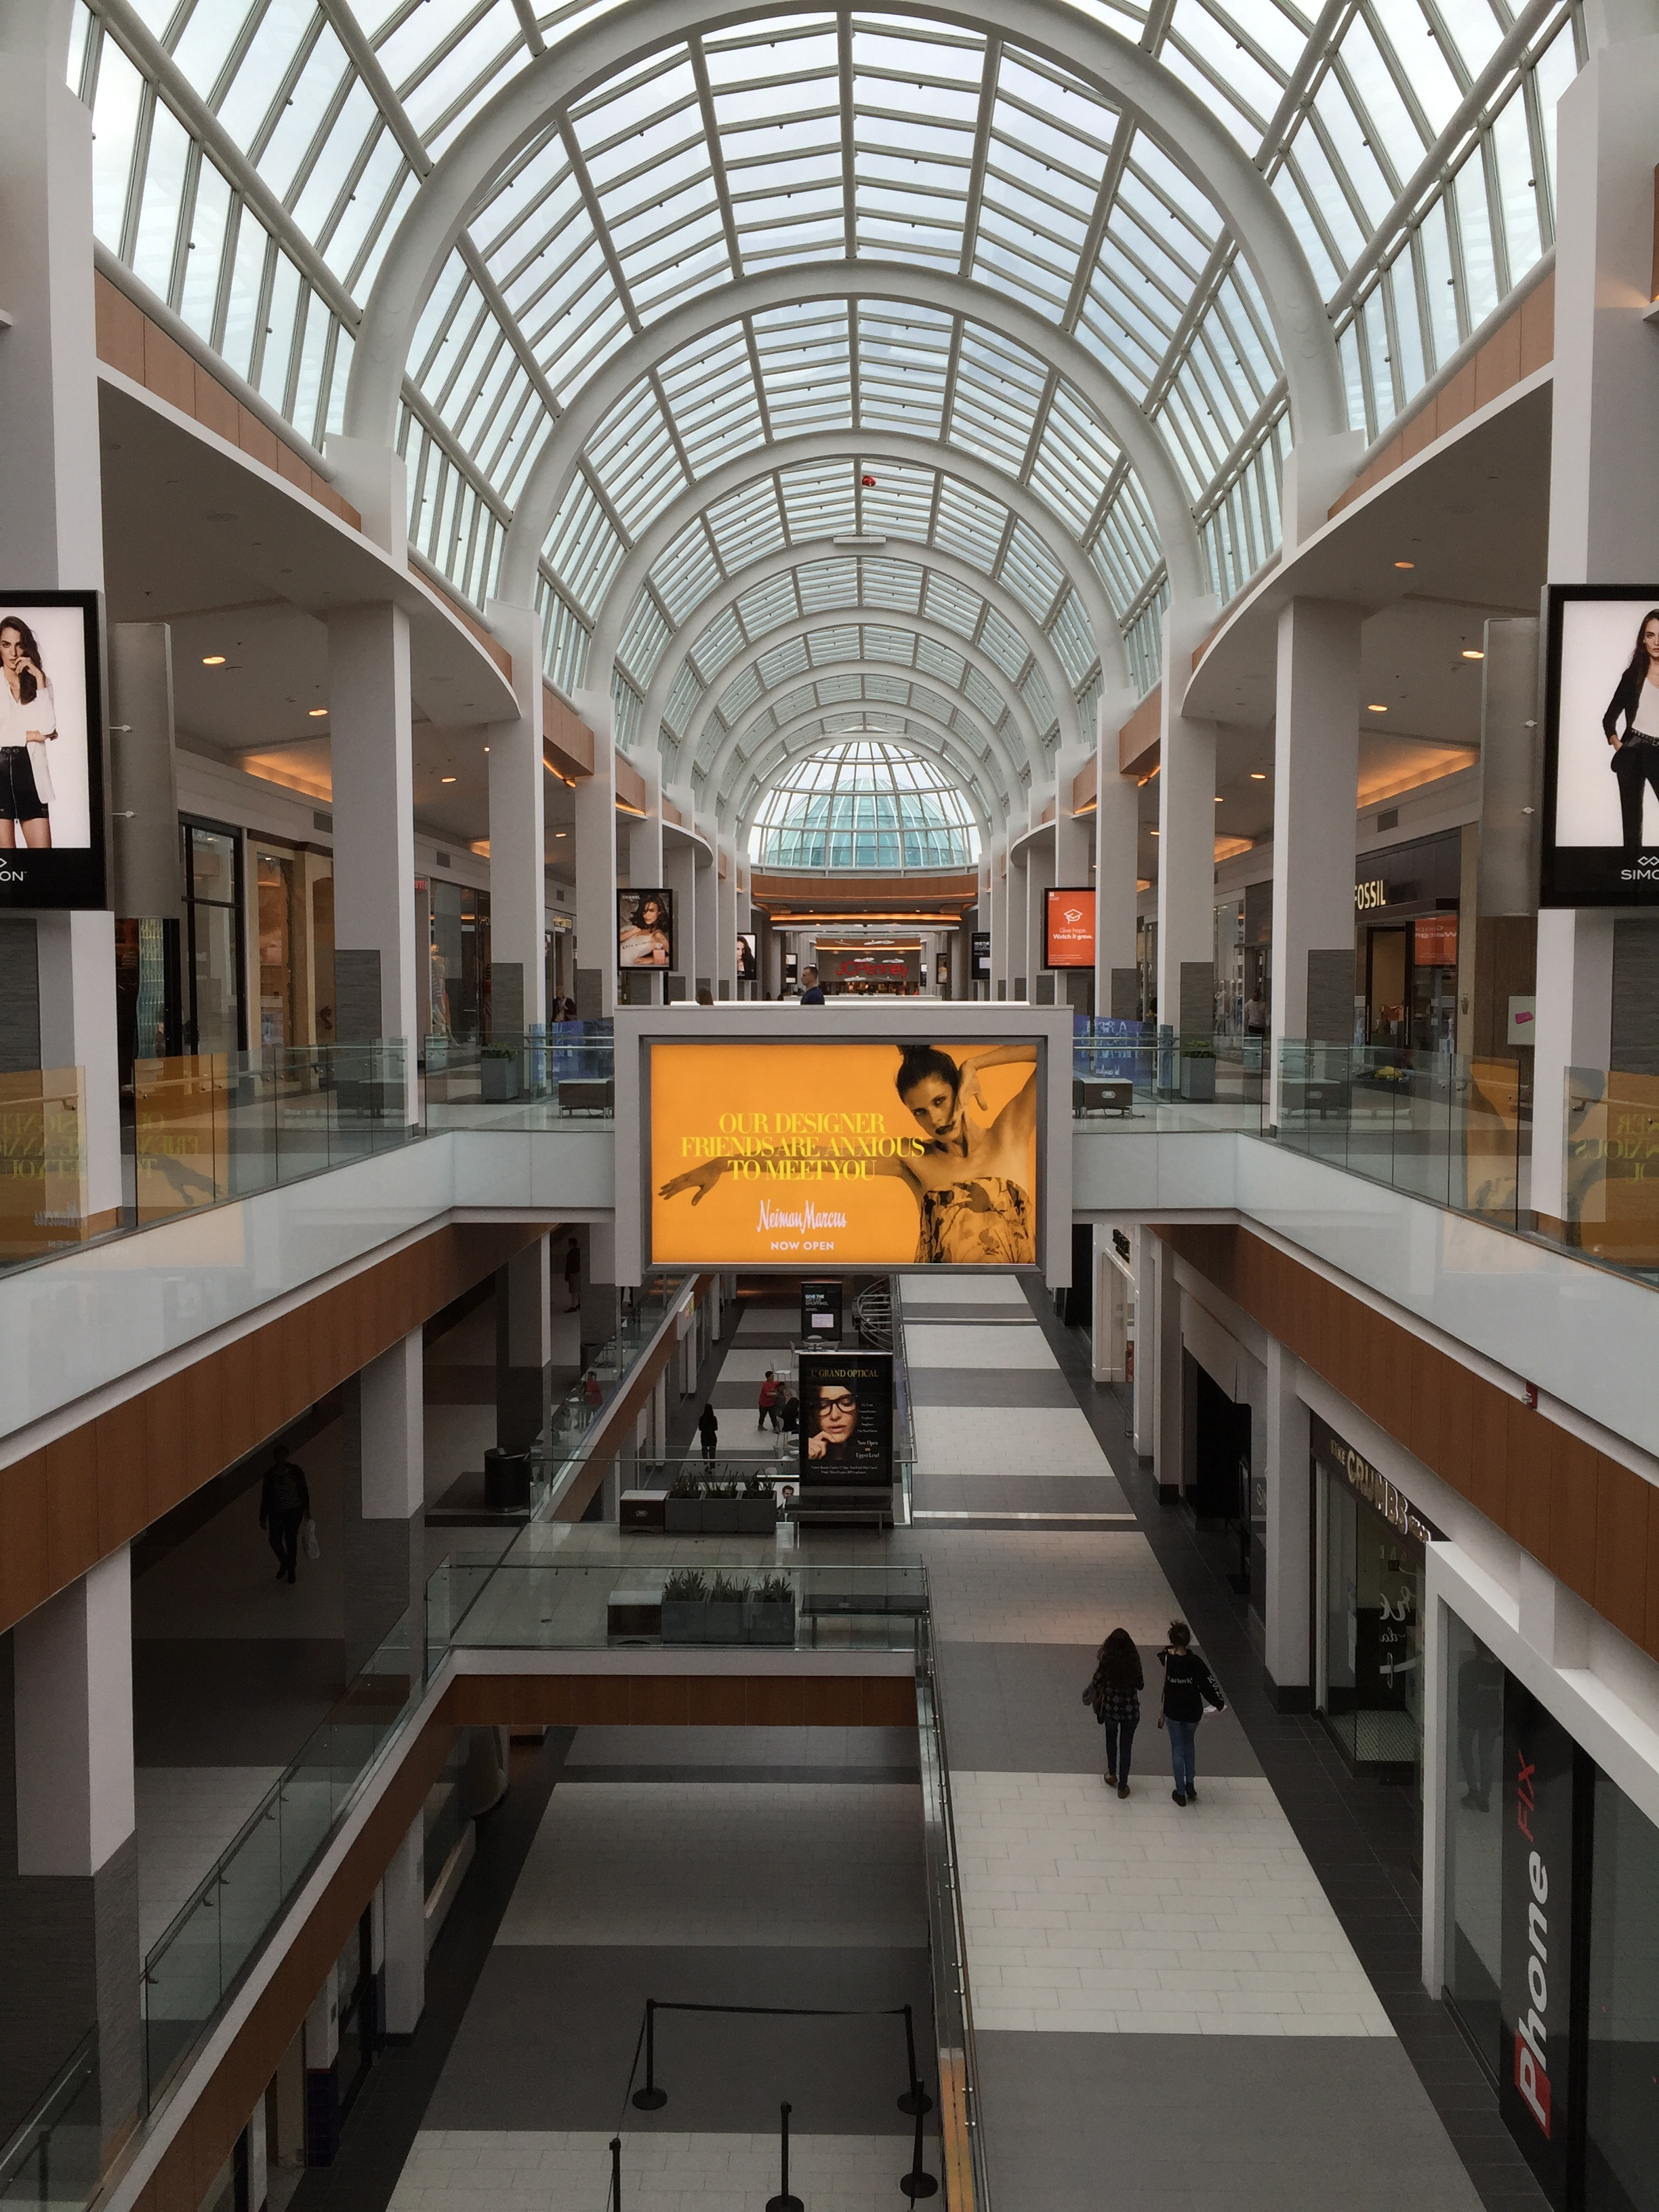 File:Roosevelt Field Mall interior 2016 jpg - Wikimedia Commons